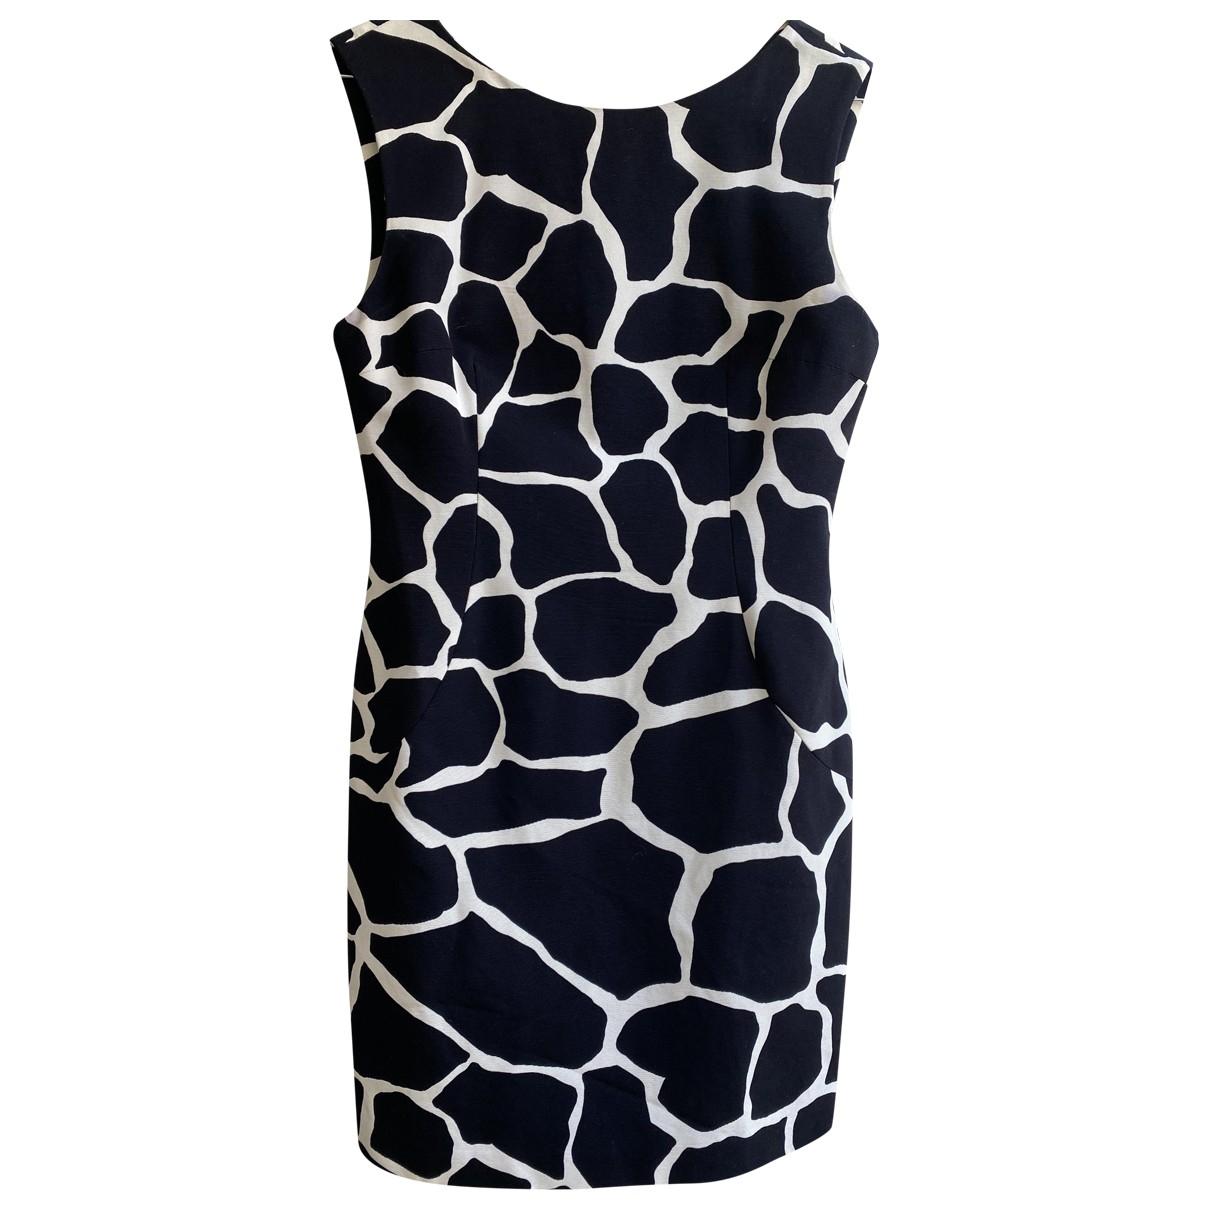 Dolce & Gabbana \N Kleid in Viskose